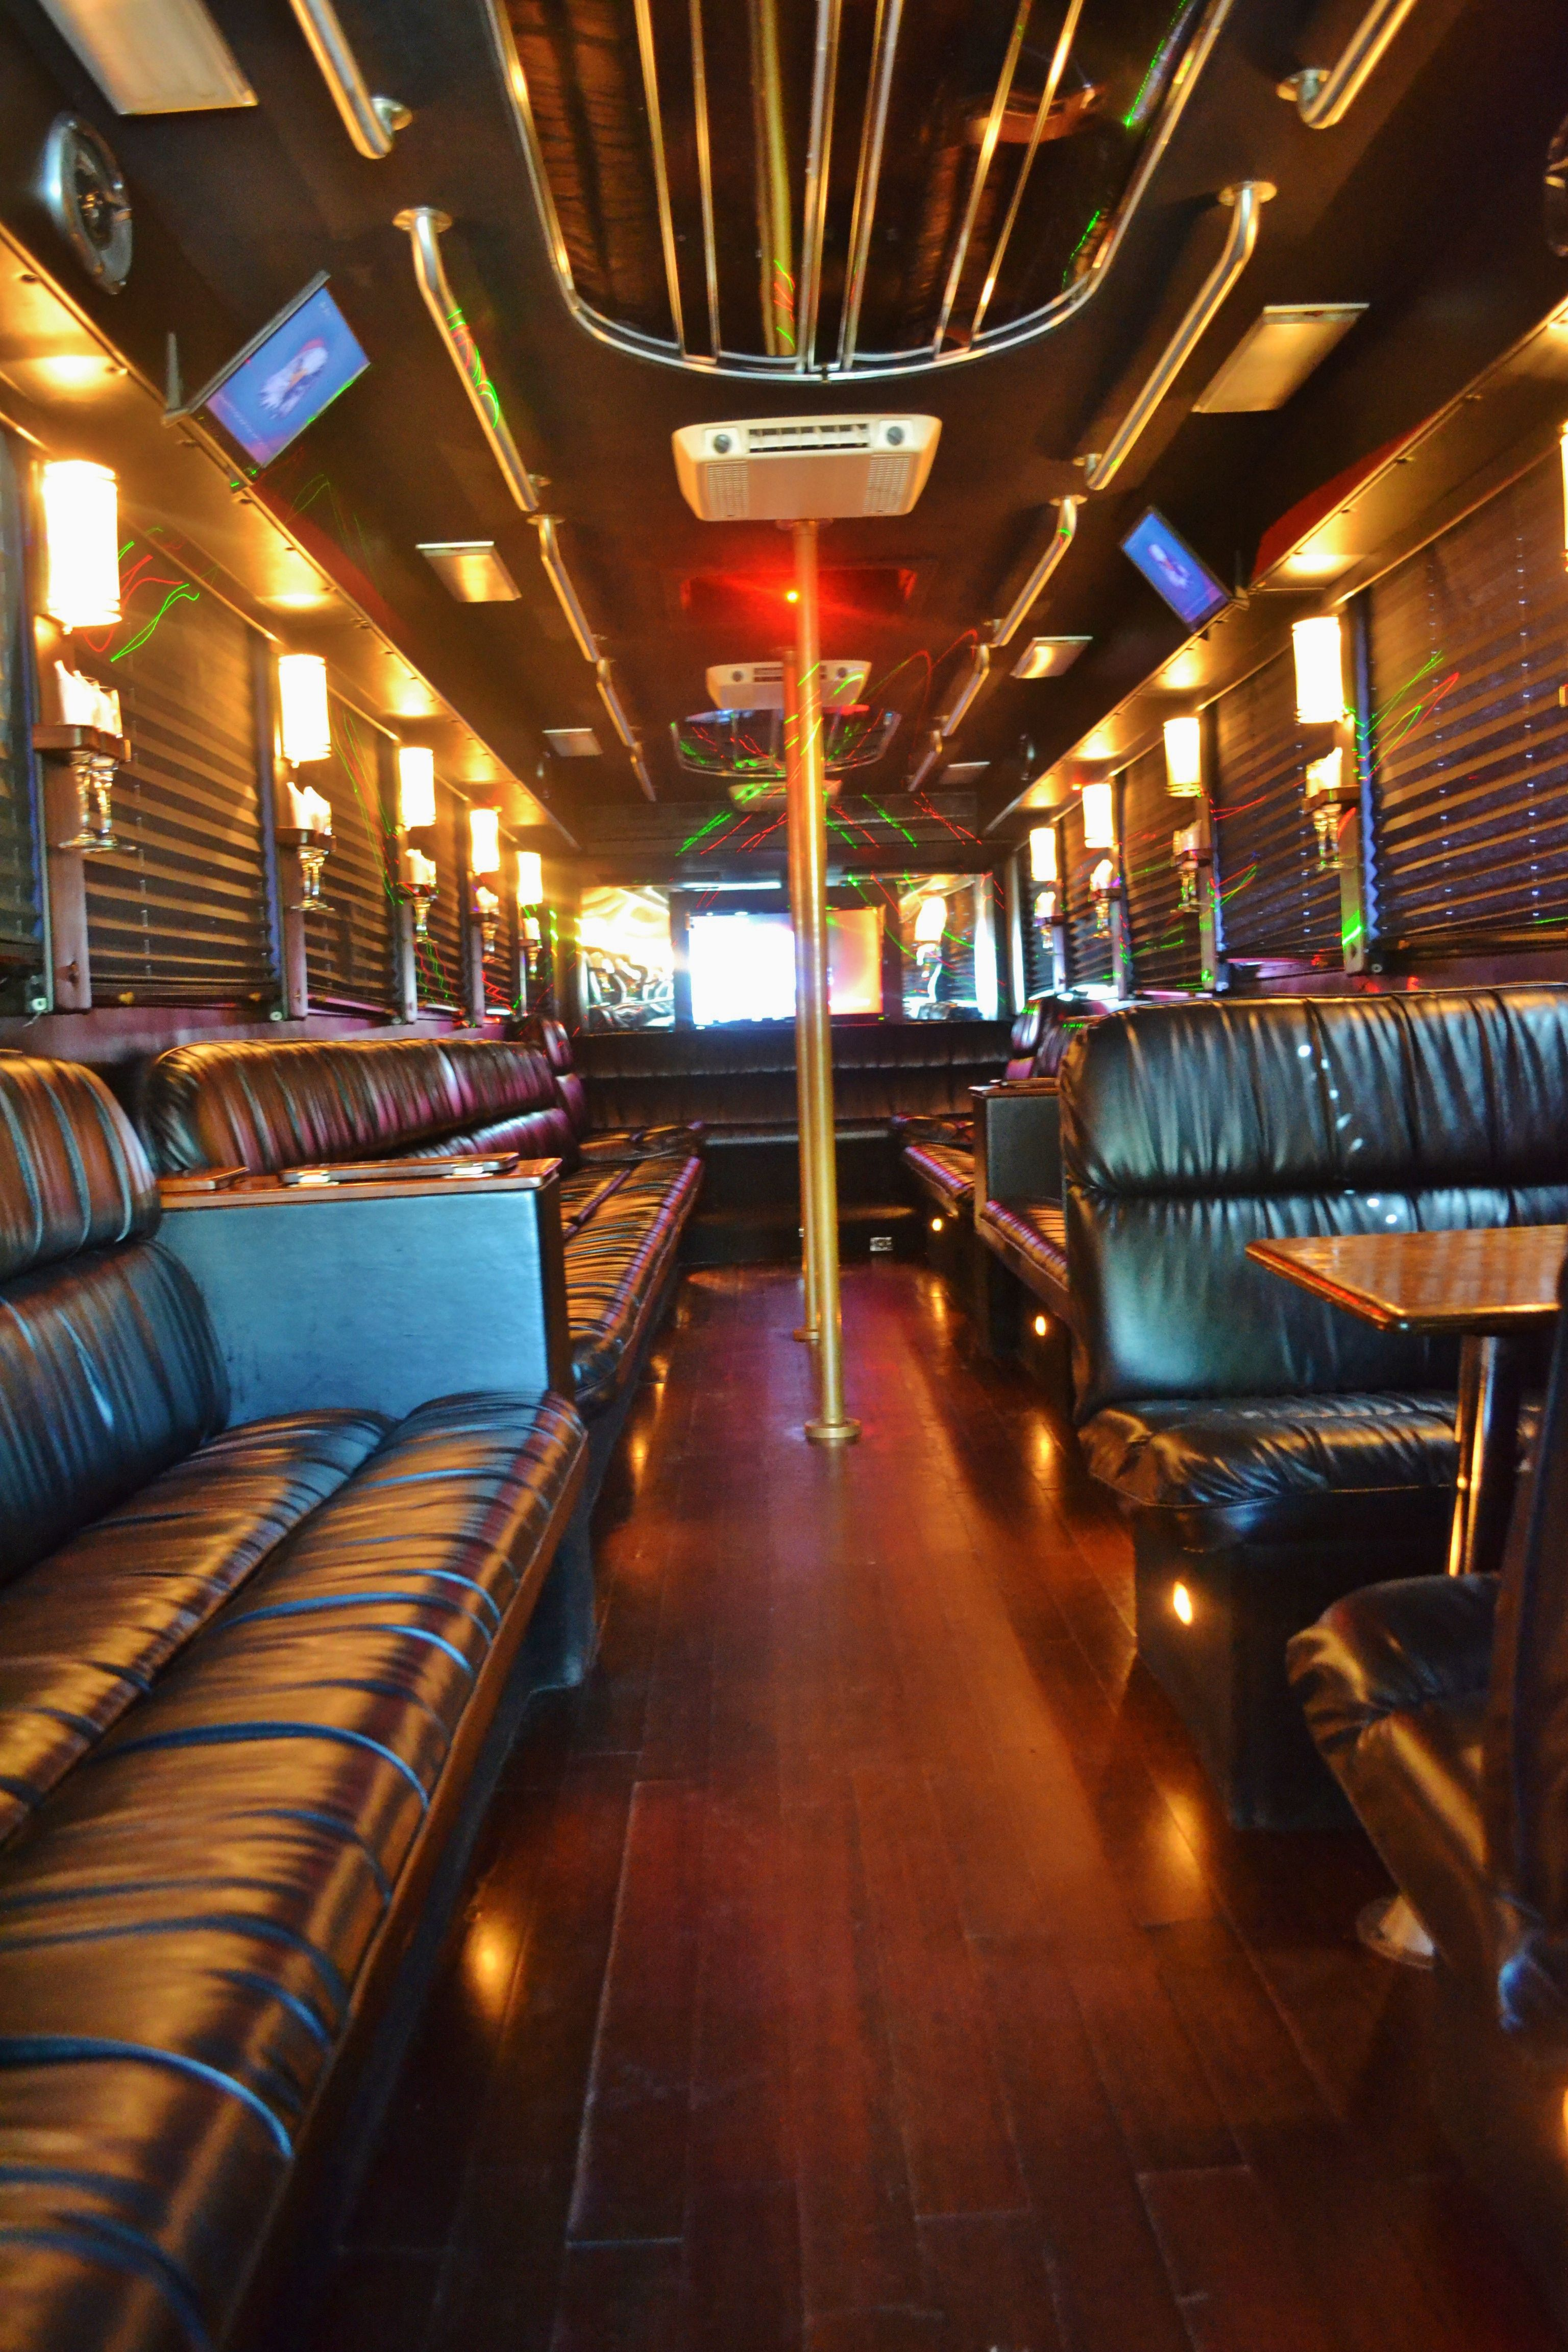 40 passenger party bus rentals interior info